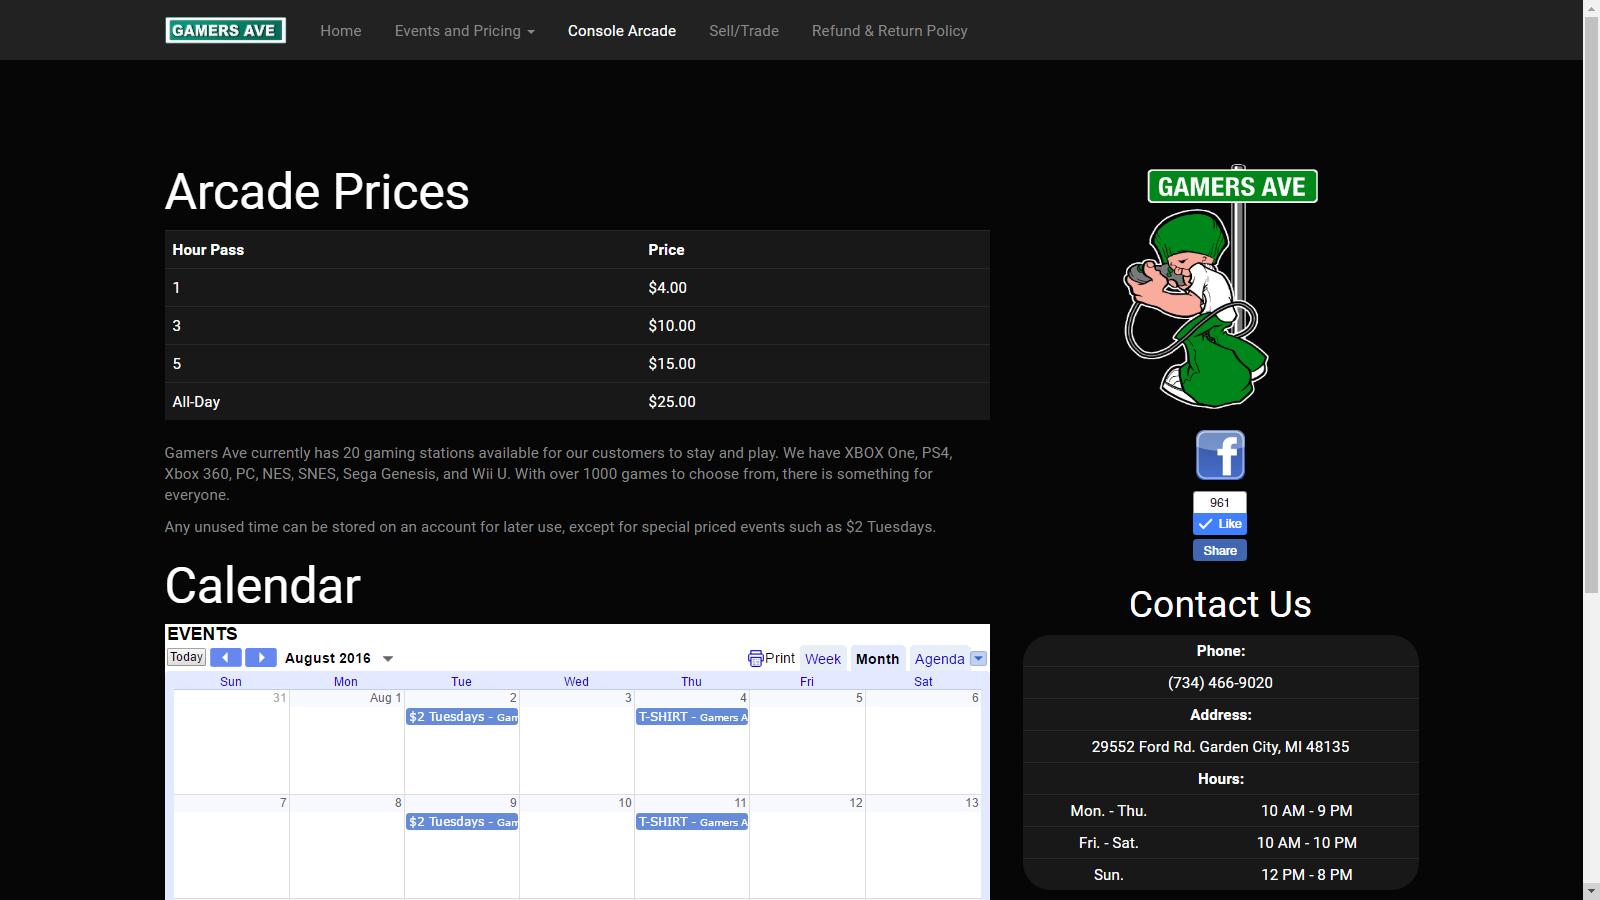 Arcade Information Page